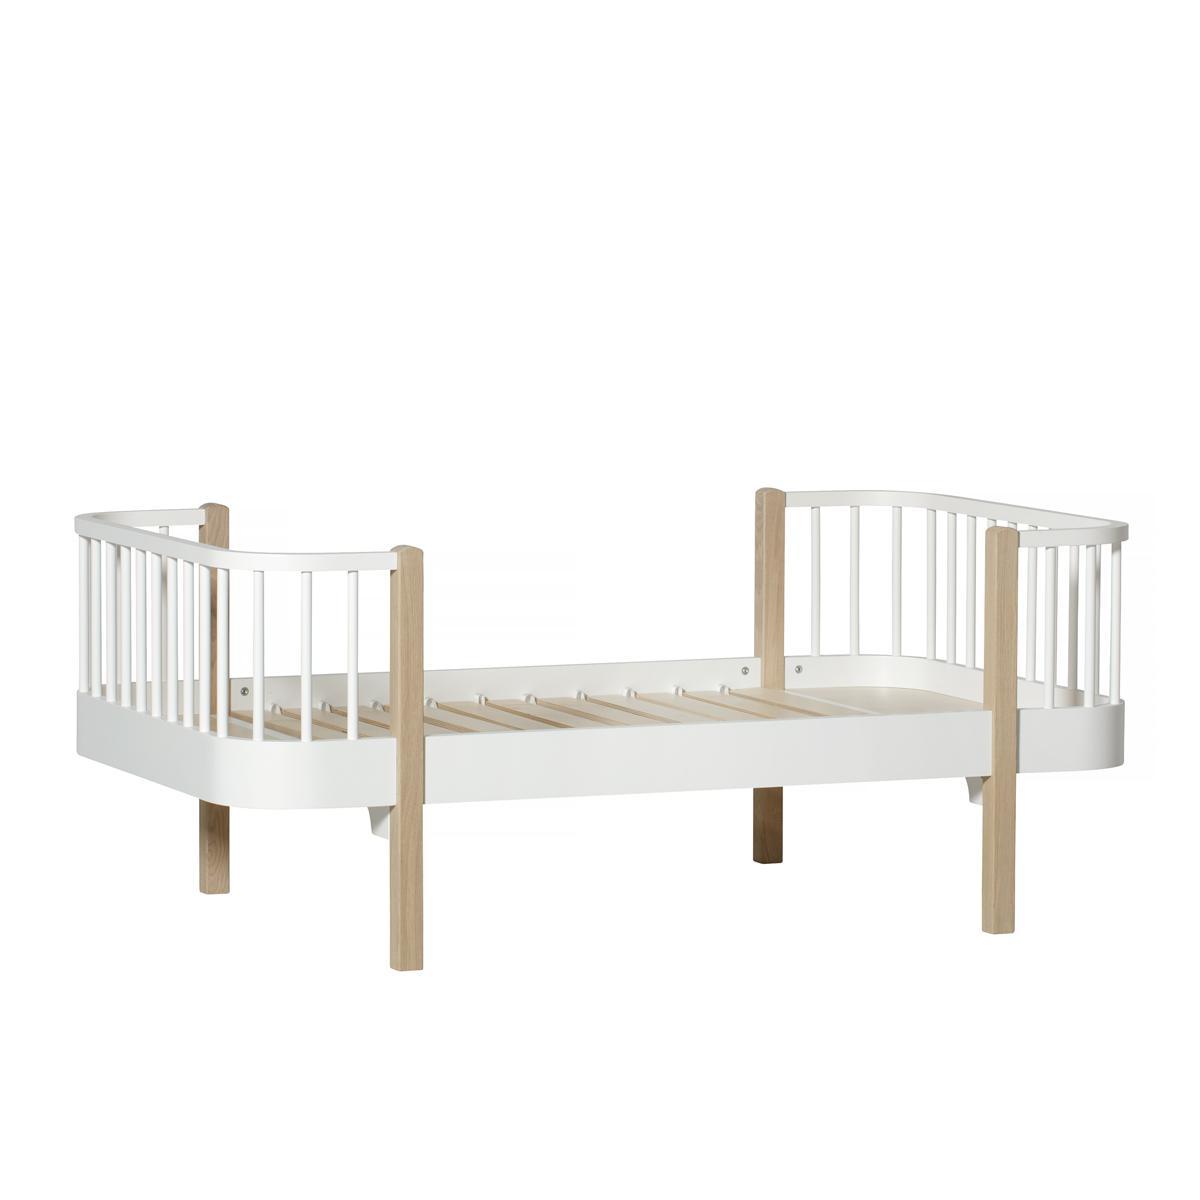 Lit bas évolutif 90x160cm WOOD Oliver Furniture blanc-chêne